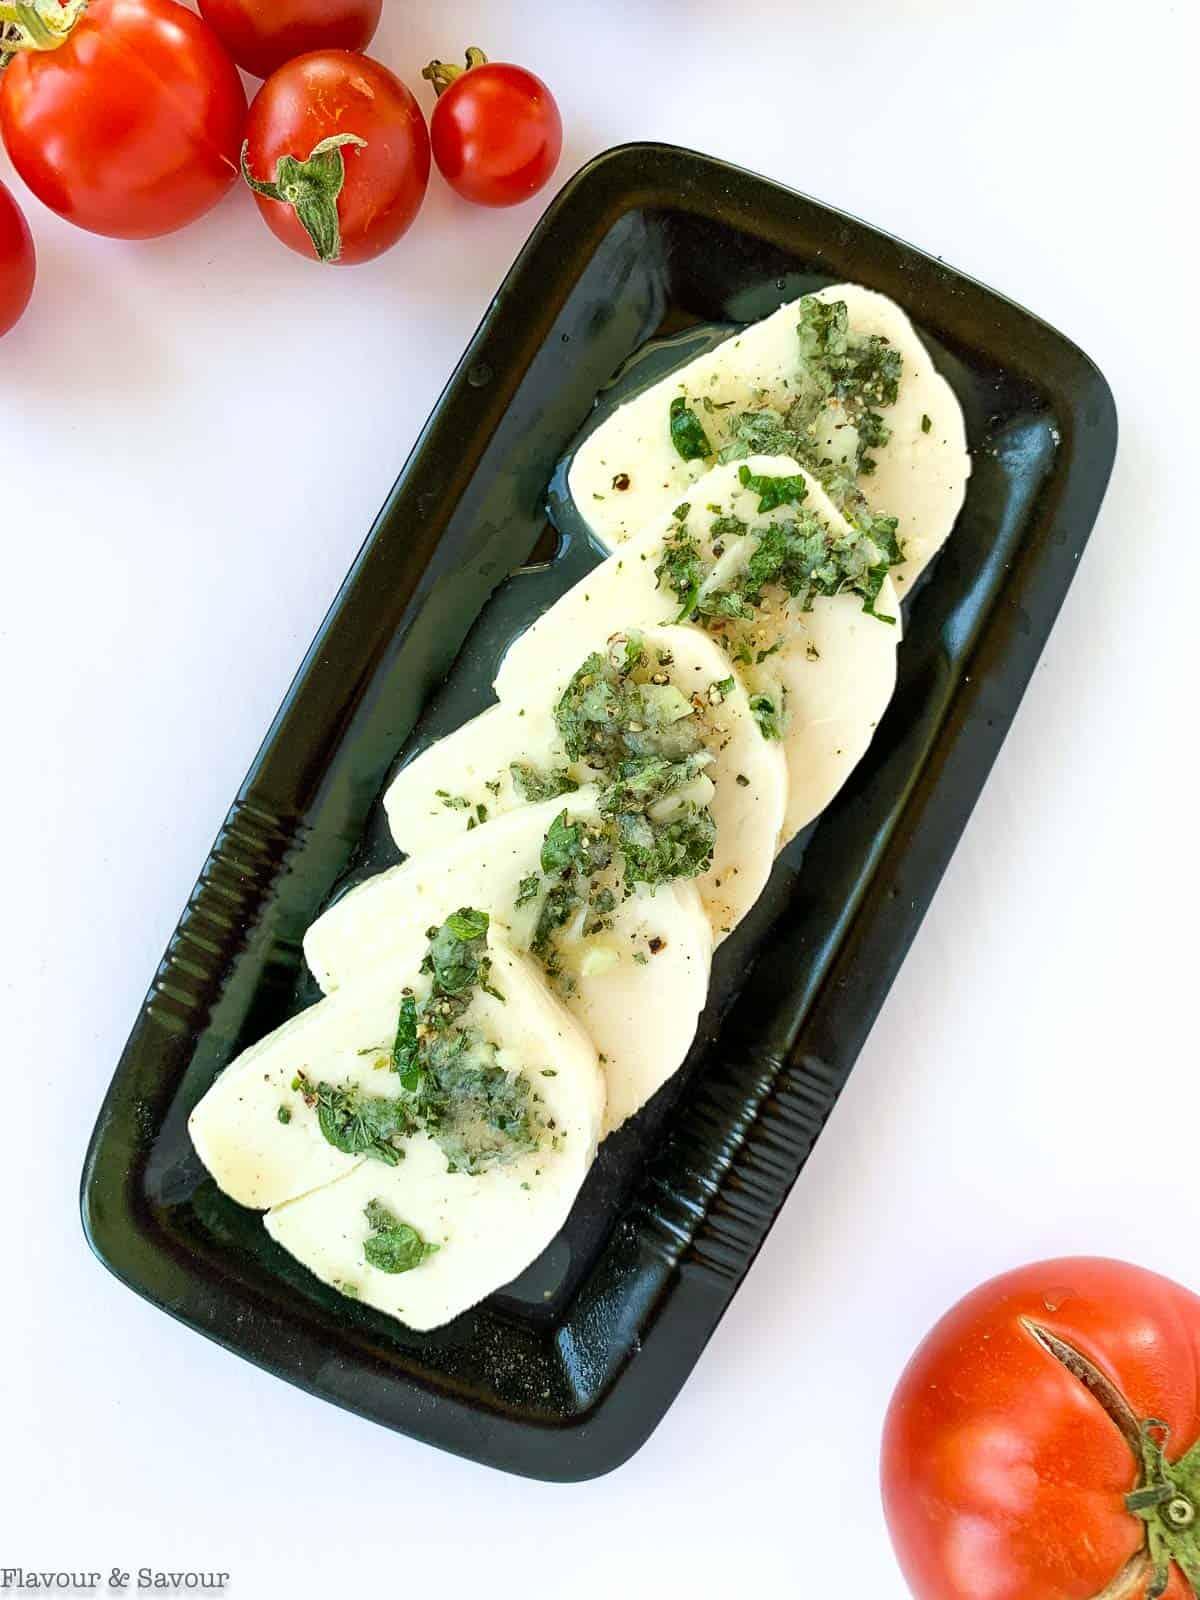 Marinating halloumi cheese with oregano garlic and lemon juice